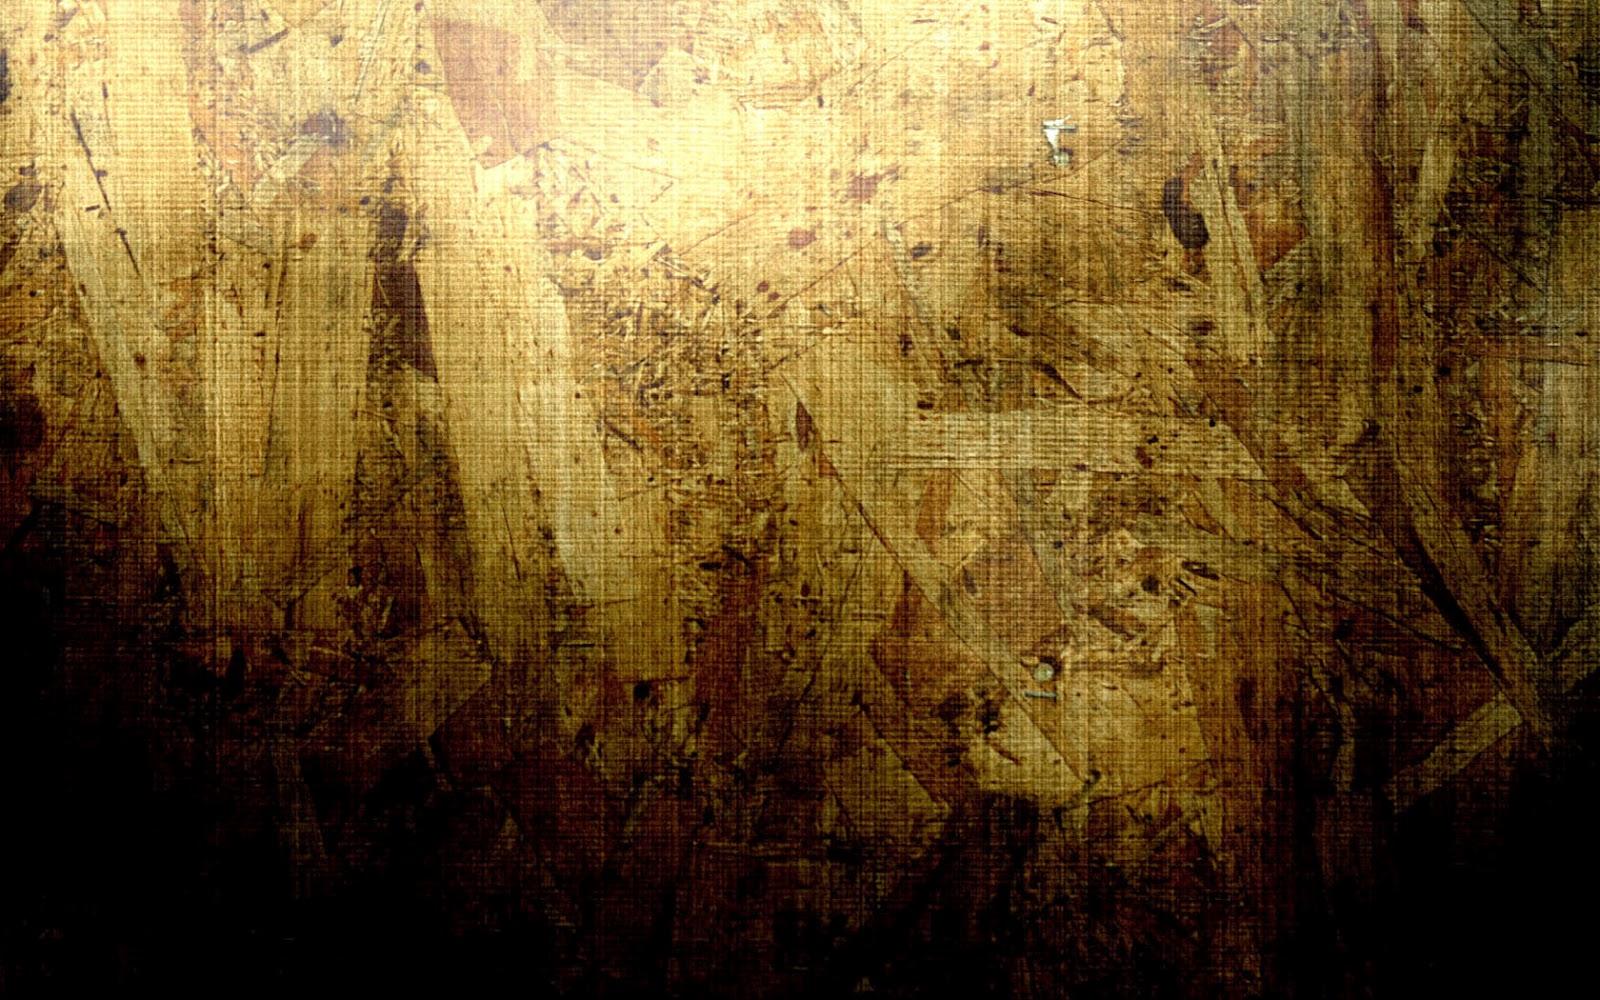 tumblr static tumblr guy backgrounds  2 jpg 1600x1000